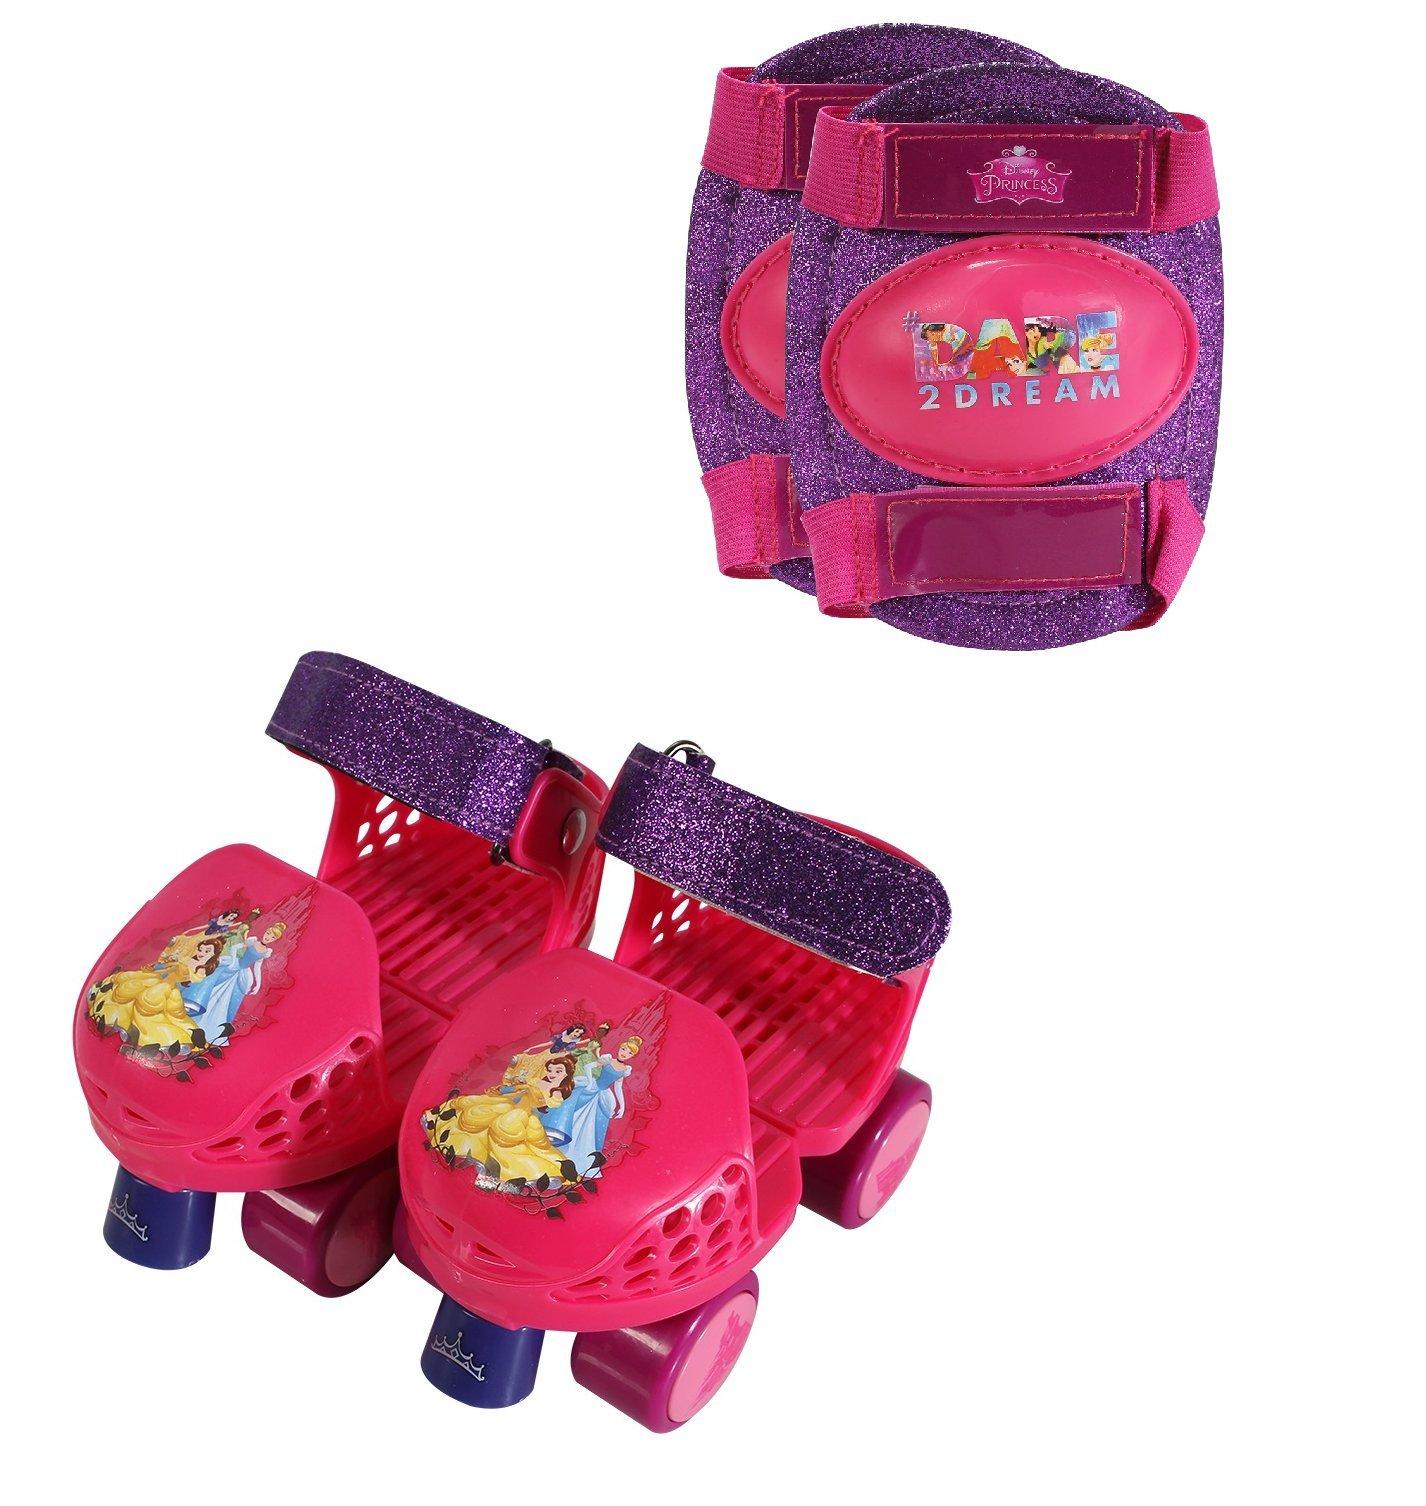 PlayWheels Disney Princess Kids Glitter Roller Skates with Knee Pads - Childrens Adjustable Skates - Junior Size 6-12 by PlayWheels